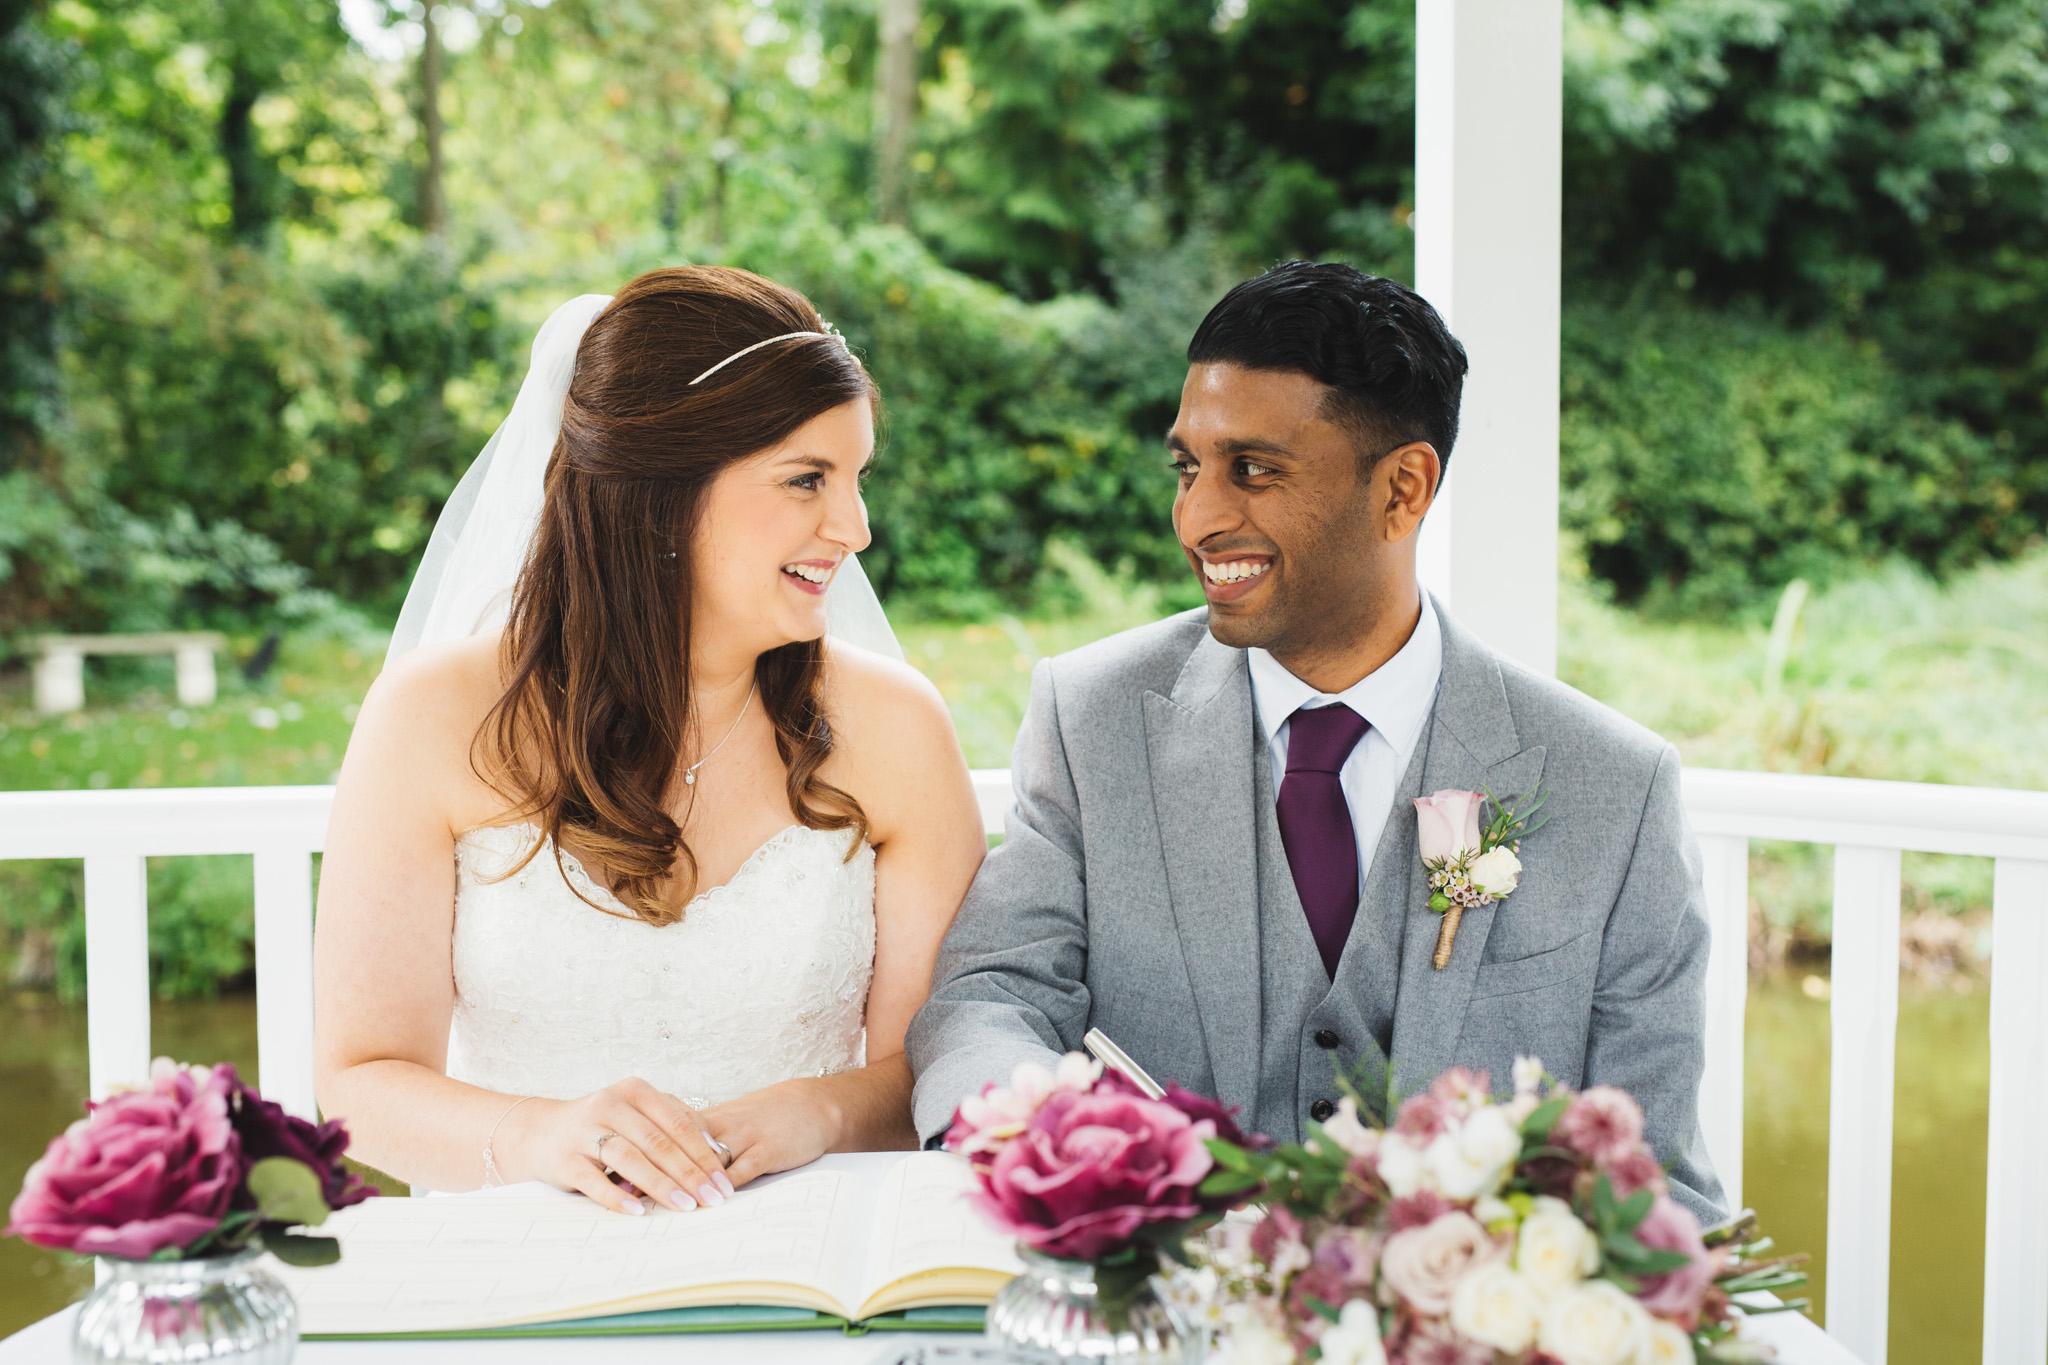 cat-lane-weddings__sheene-mill-wedding-photography__clw__1433__C5A9212.jpg